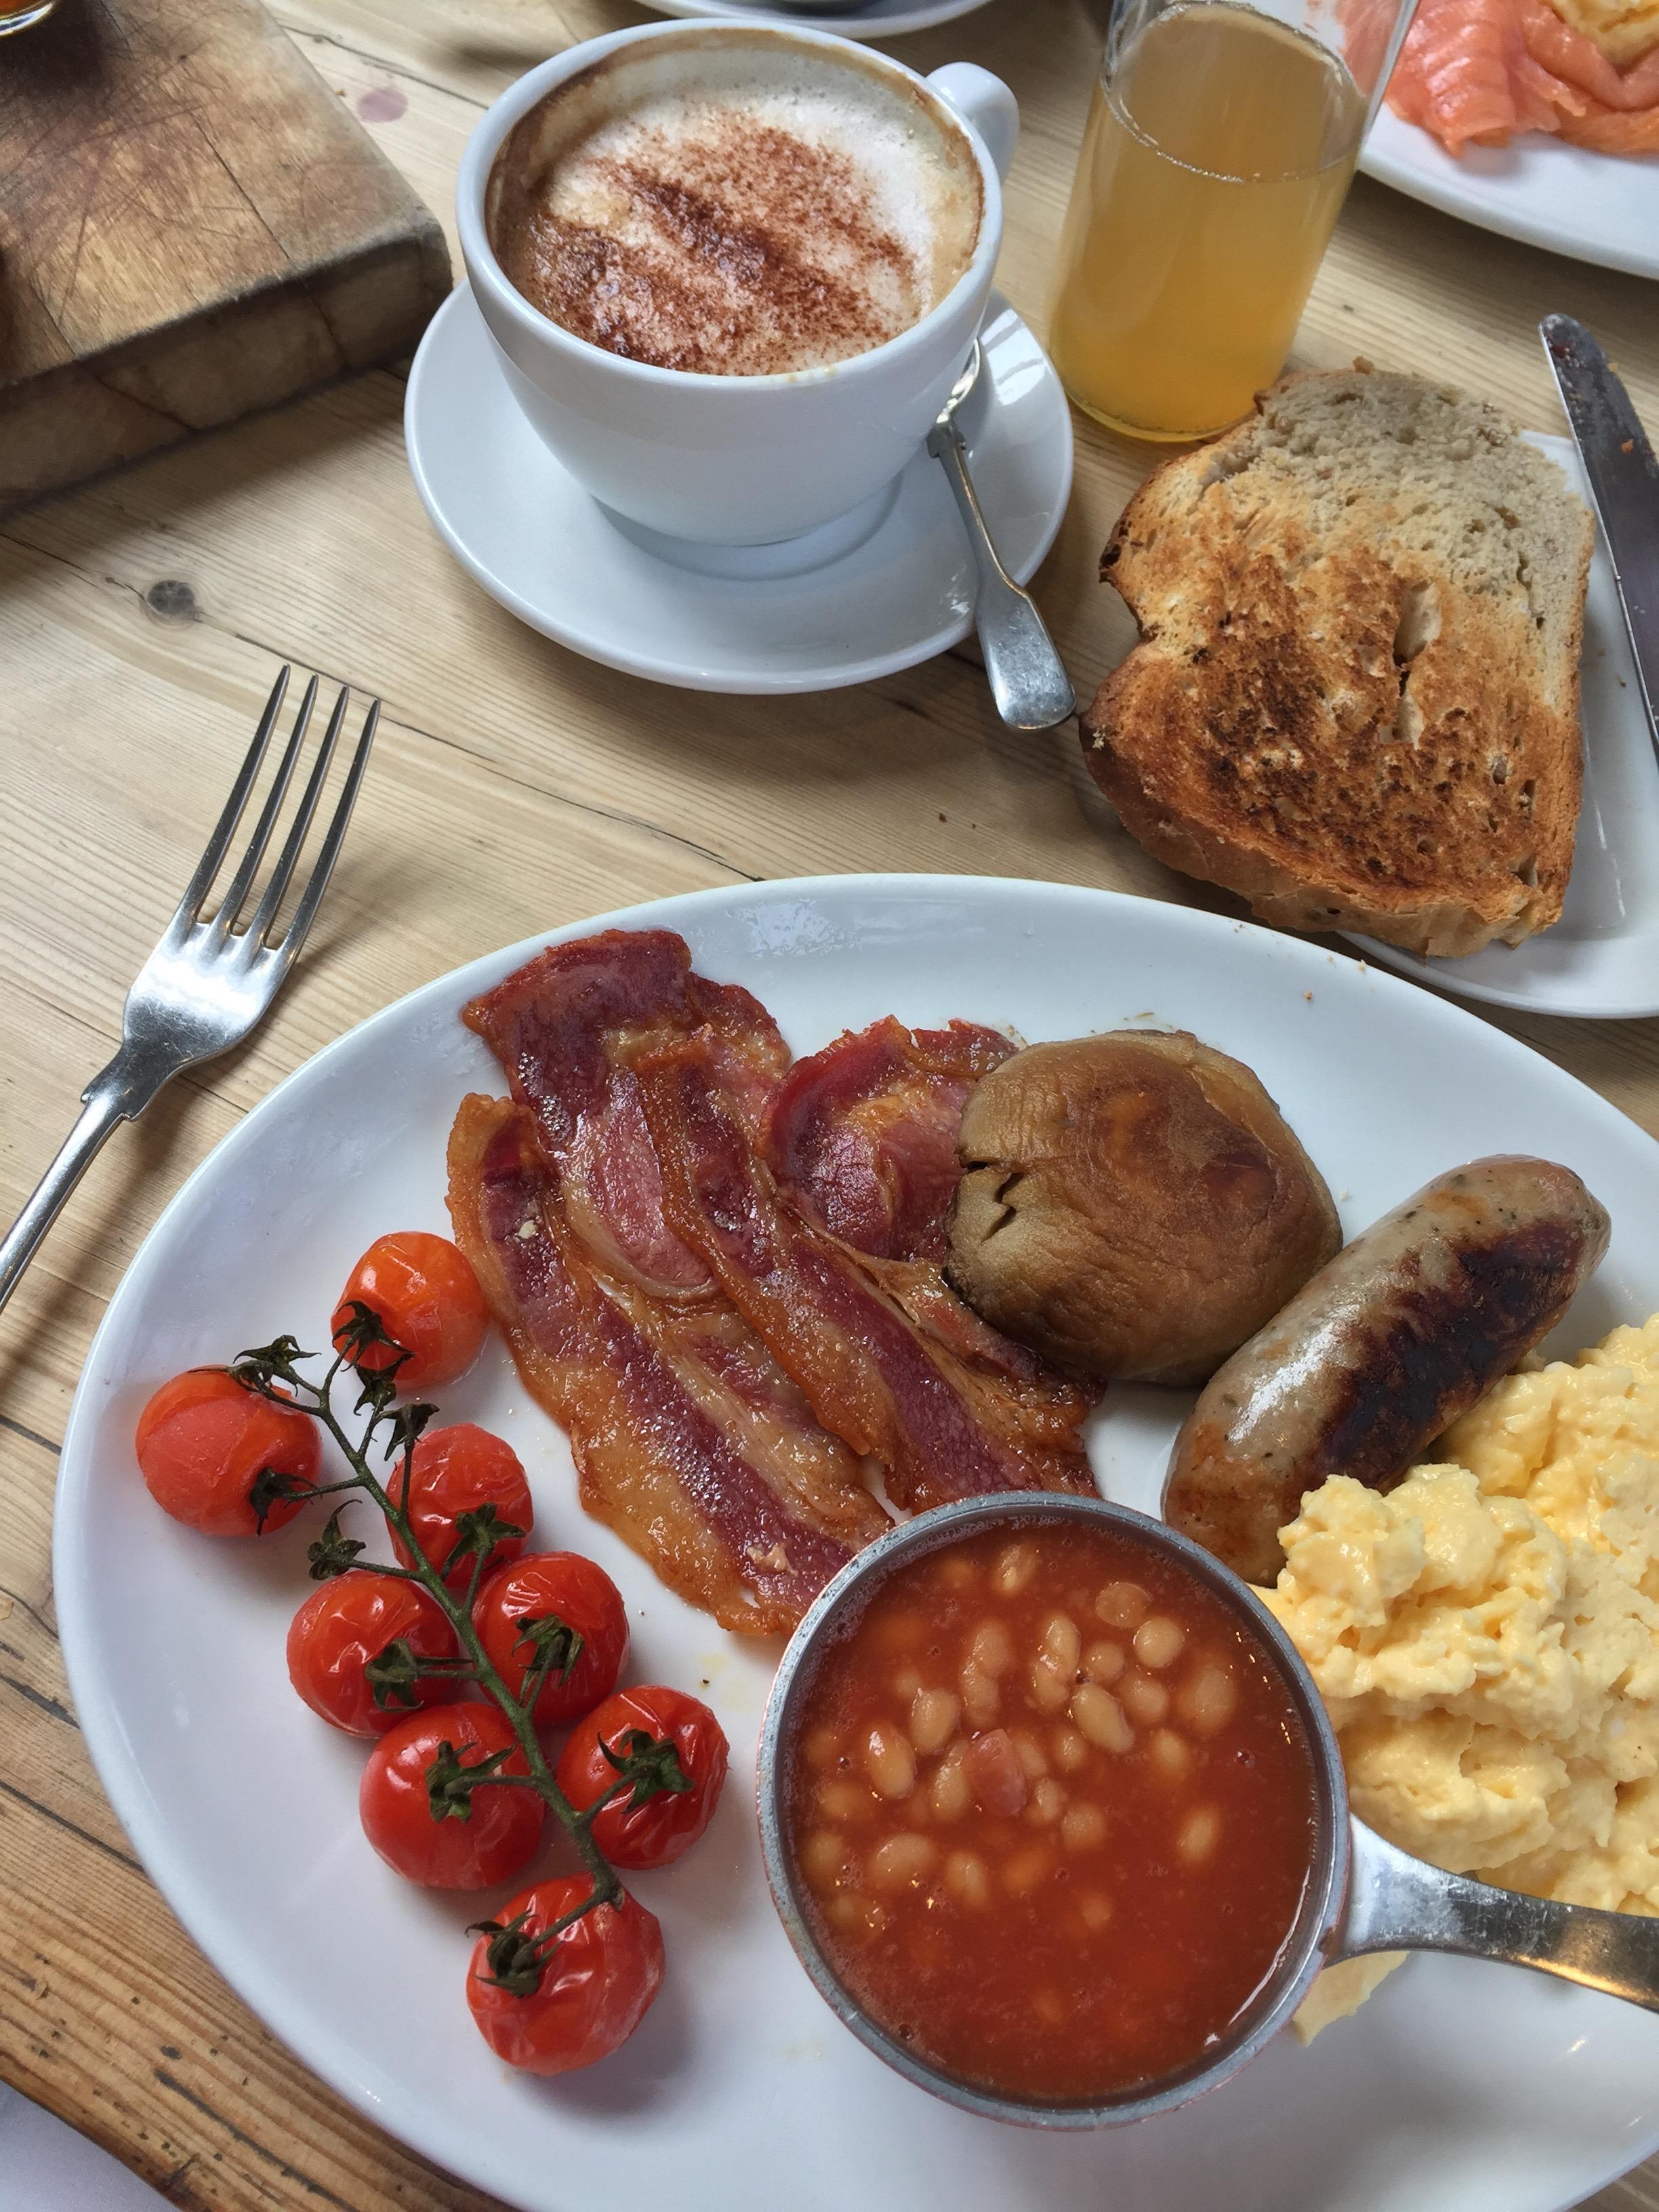 Full English Breakfast at the Three Daggers, Wiltshire